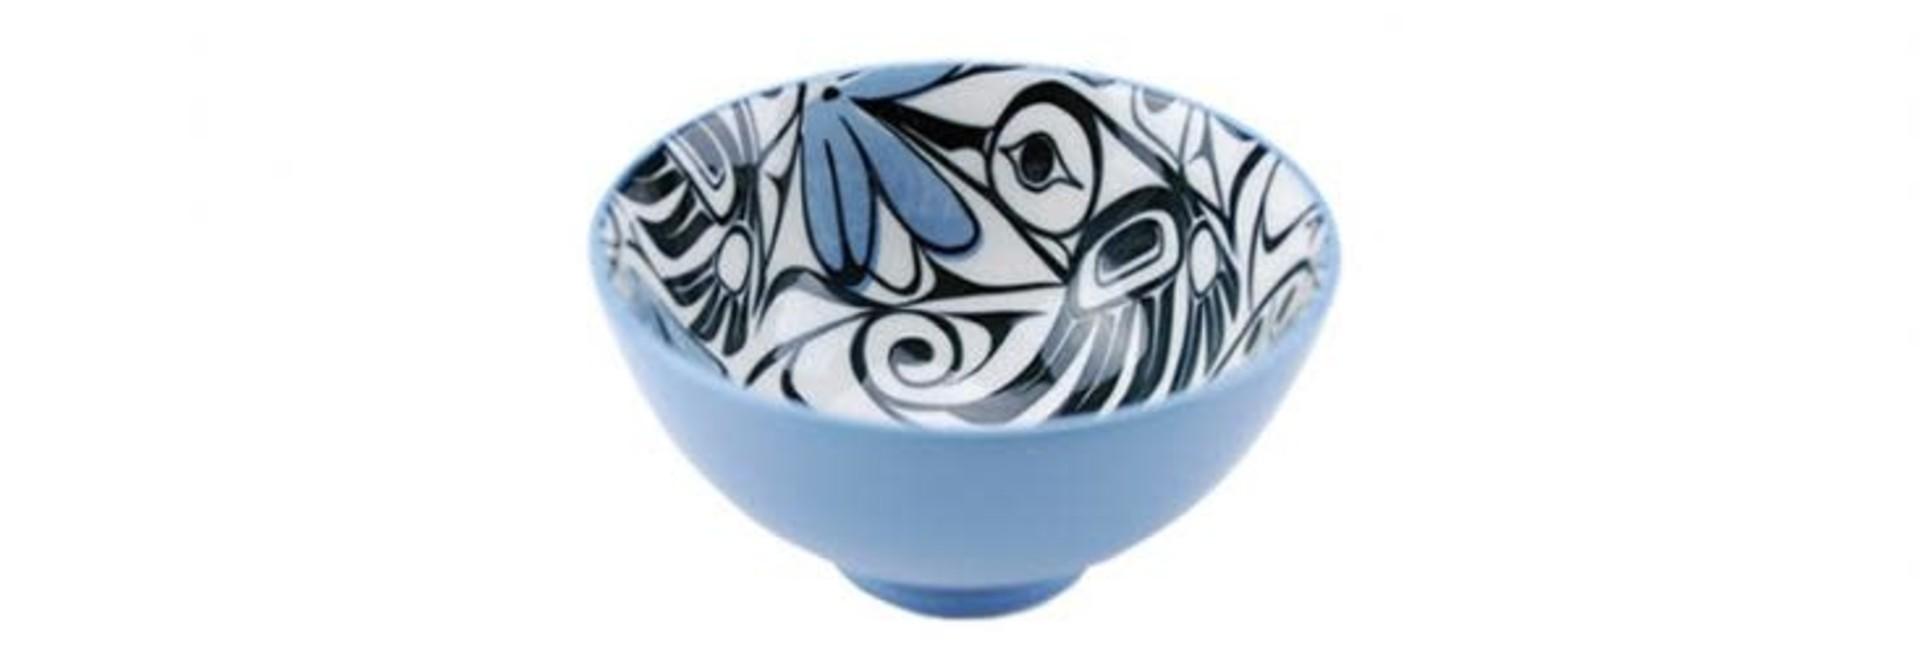 BH Hummingbird Small Bowl